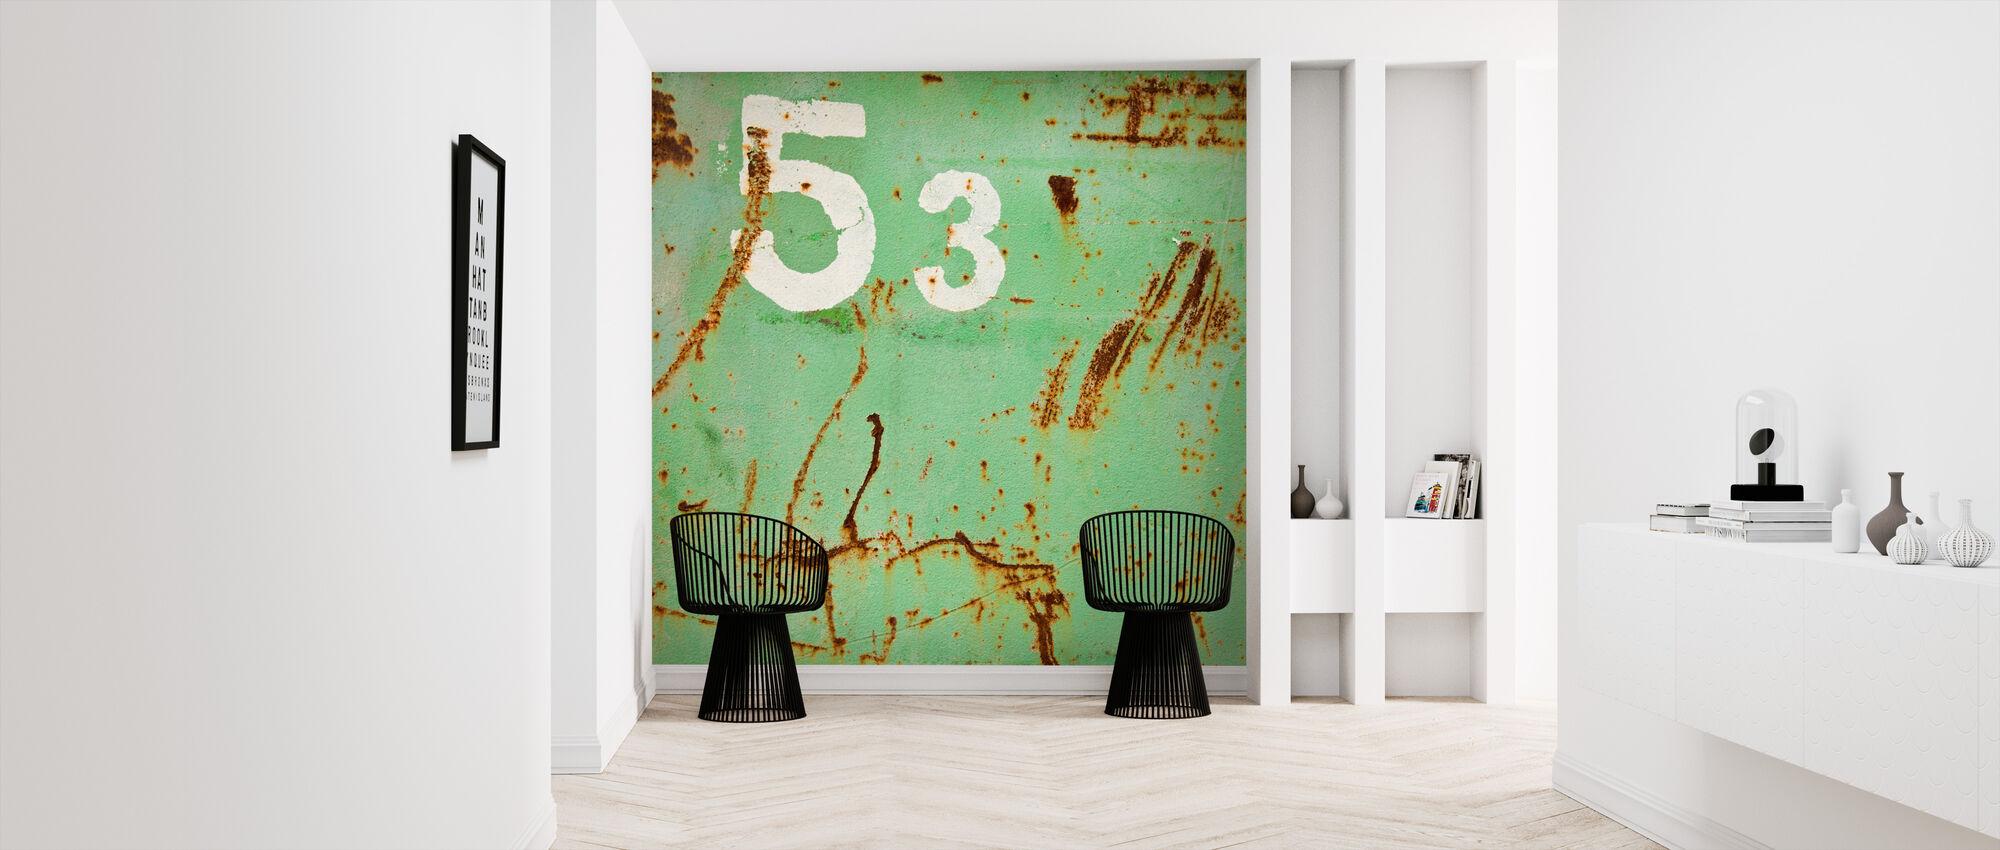 Grunge Fifty-three - Wallpaper - Hallway